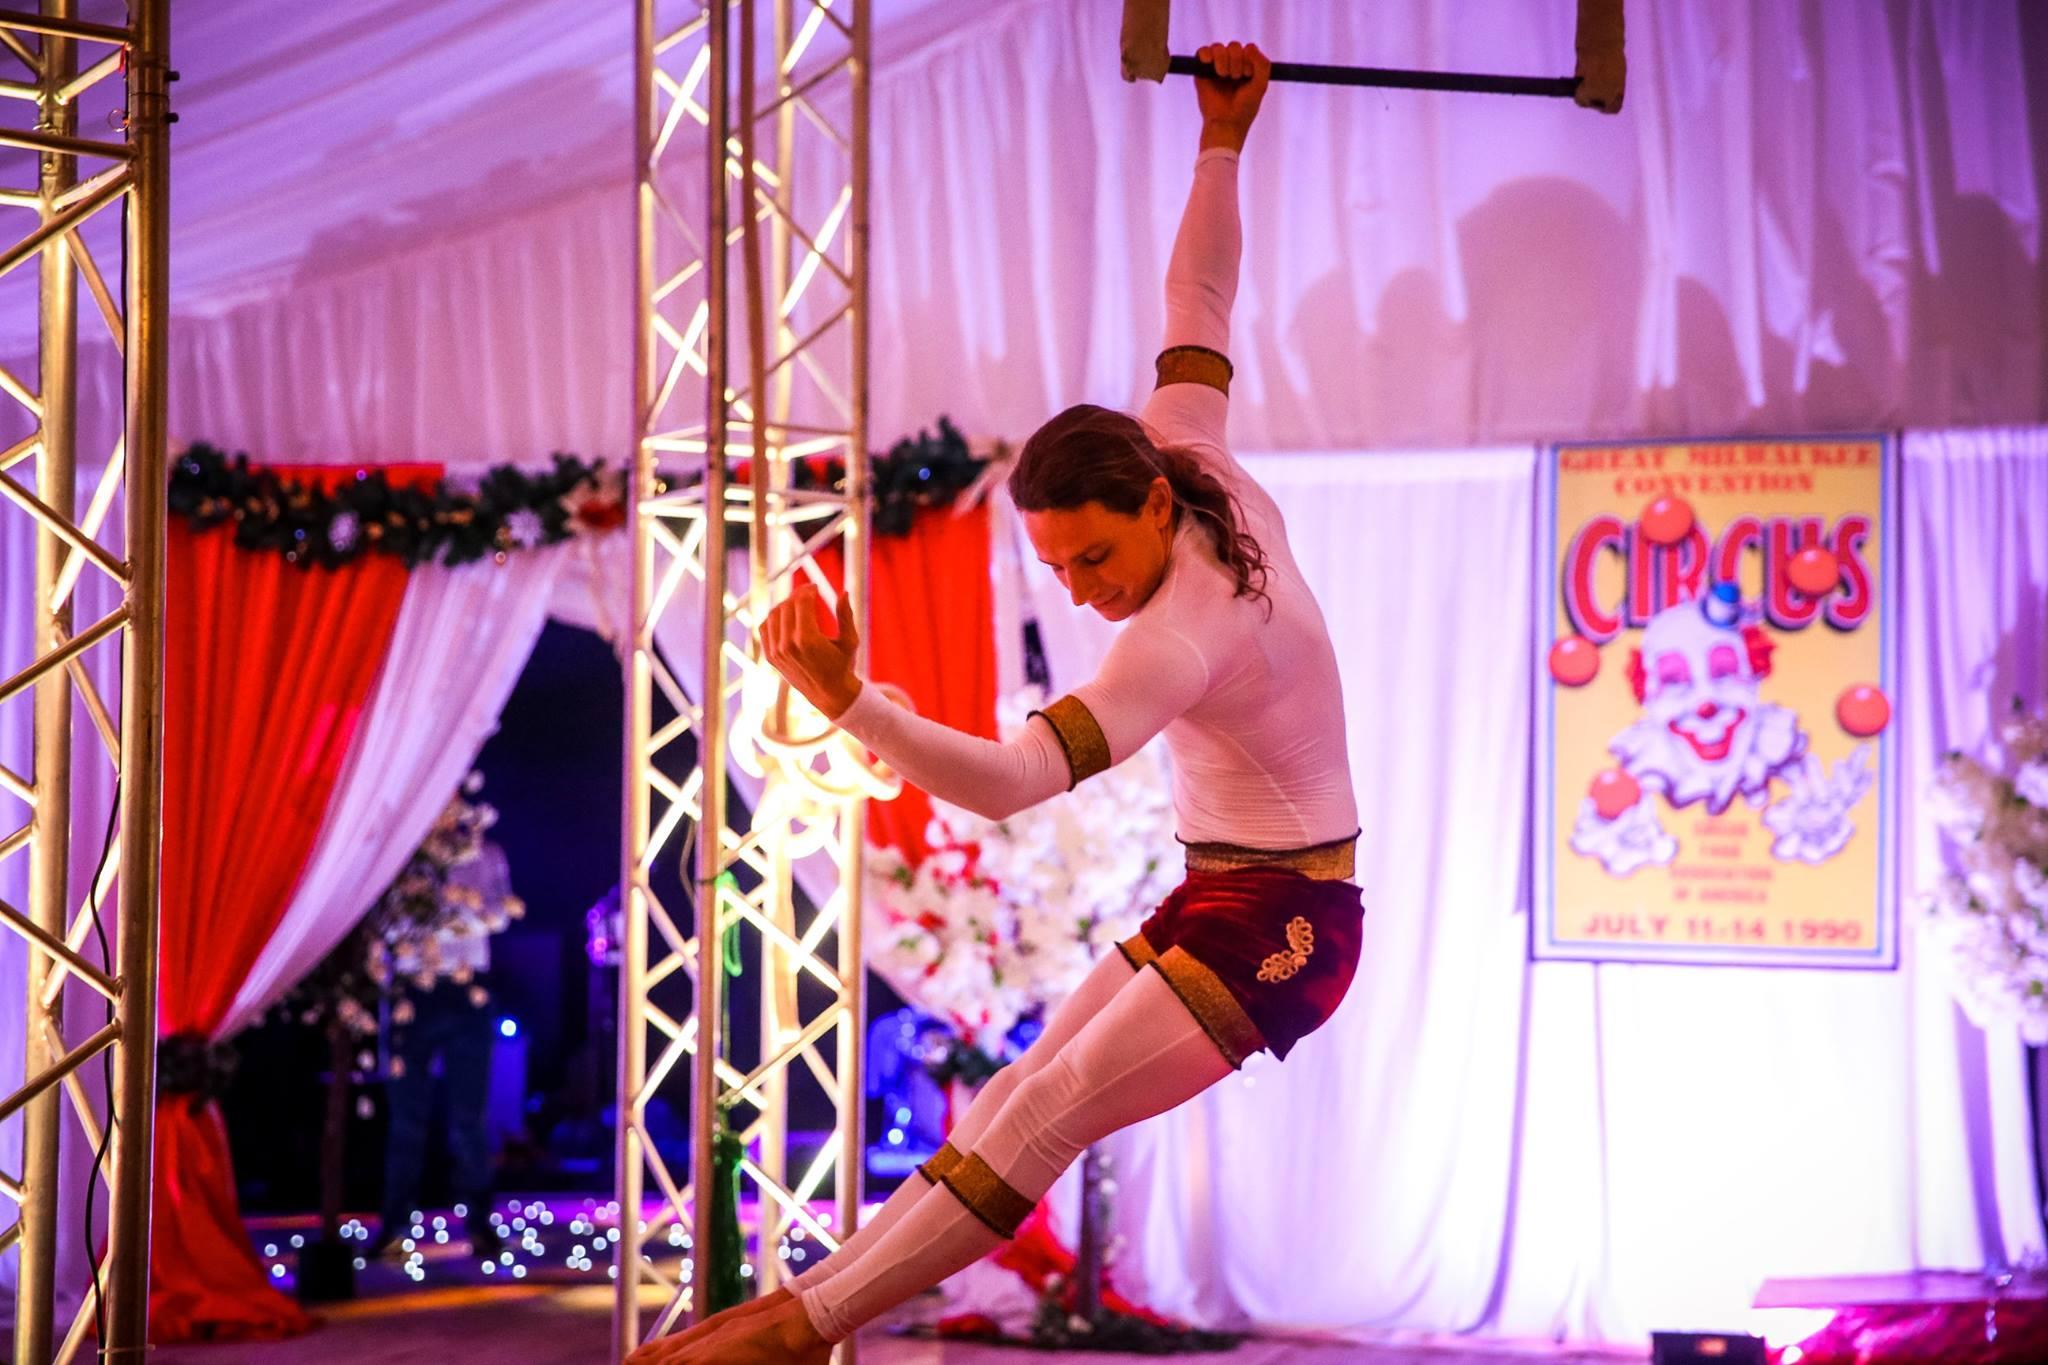 Pendragon Circus: New Year Circus themed Gala Event